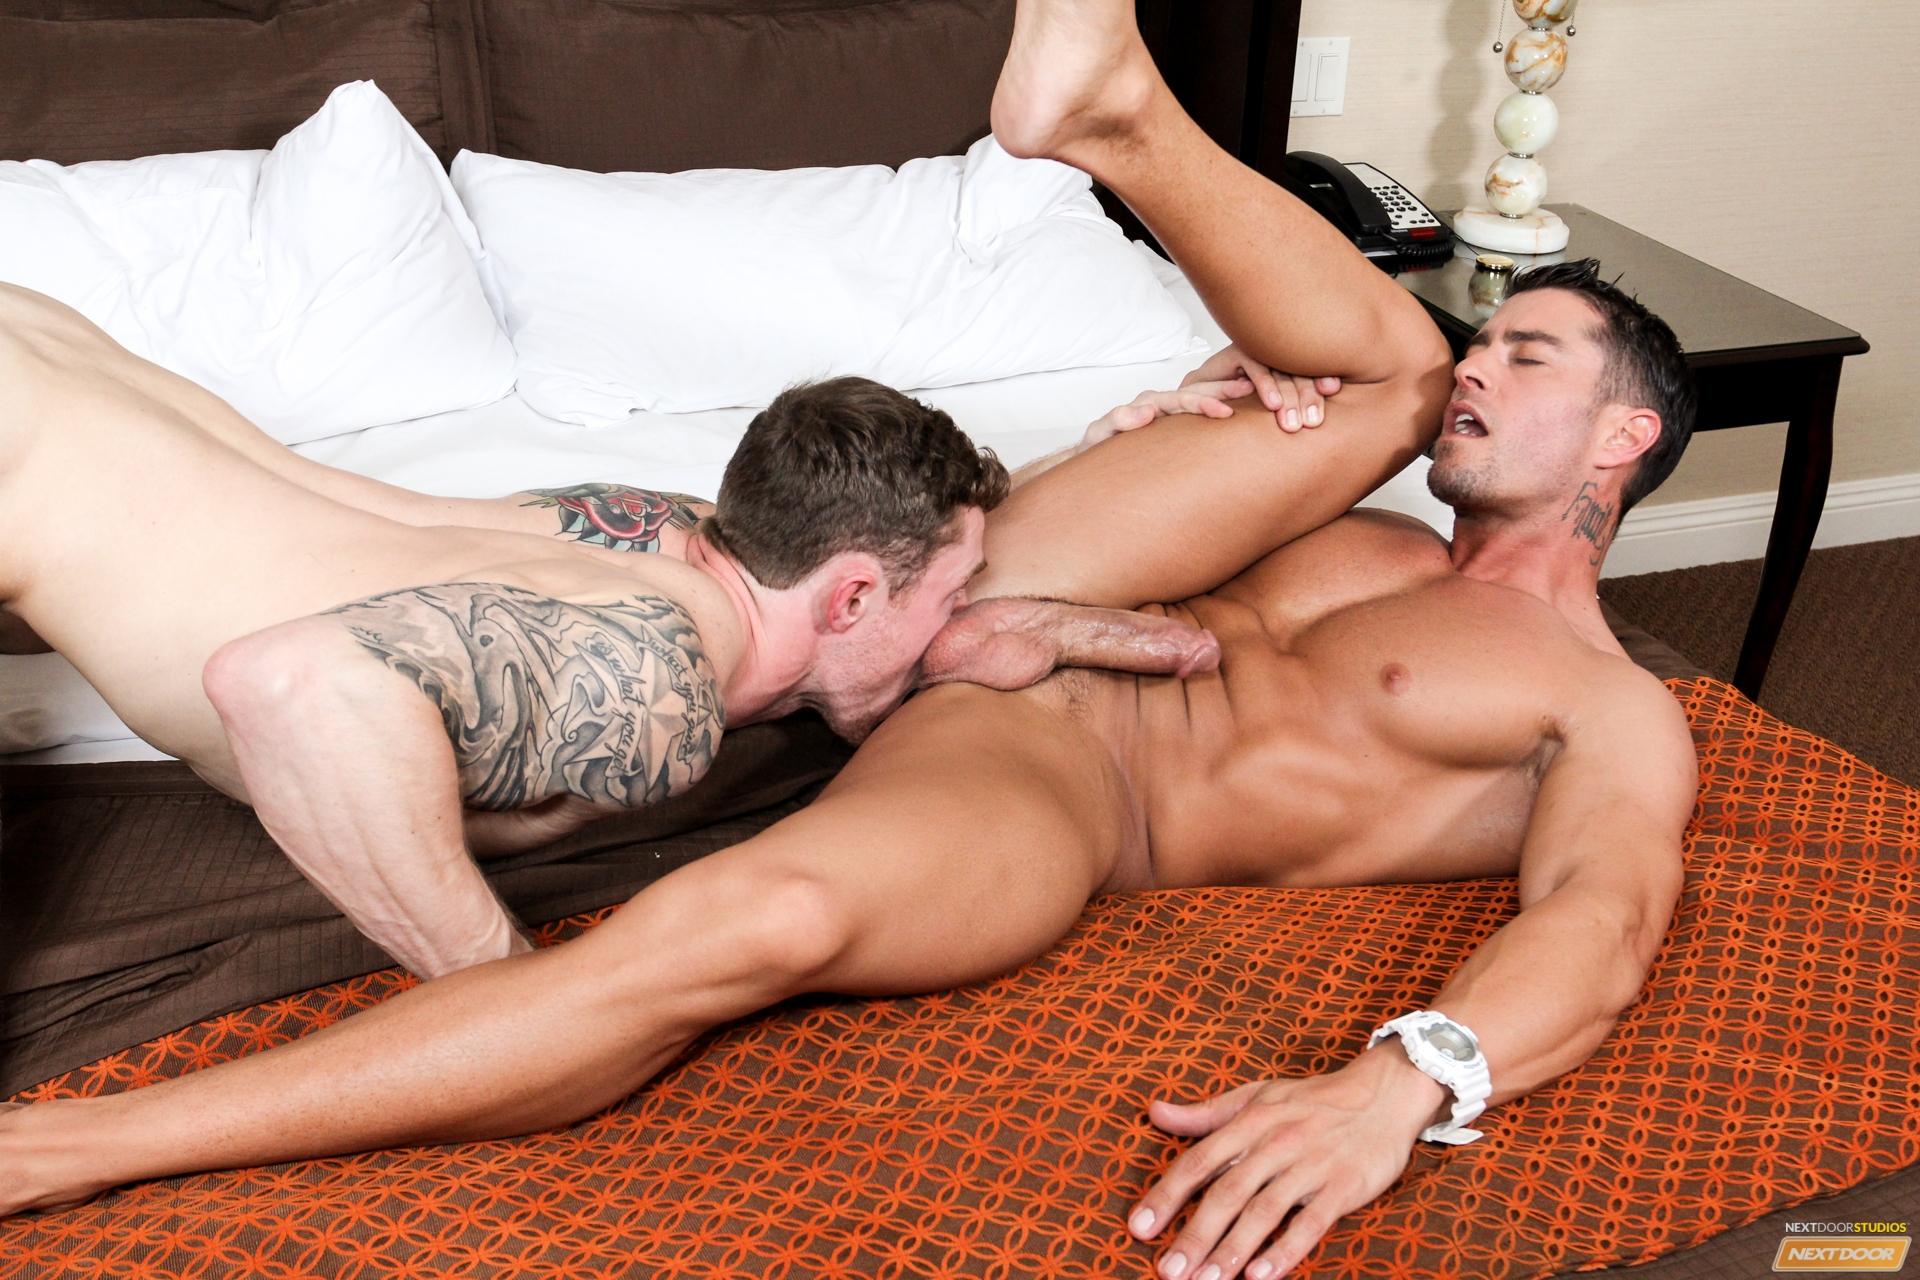 patrick praha escort gay gay seduction escort